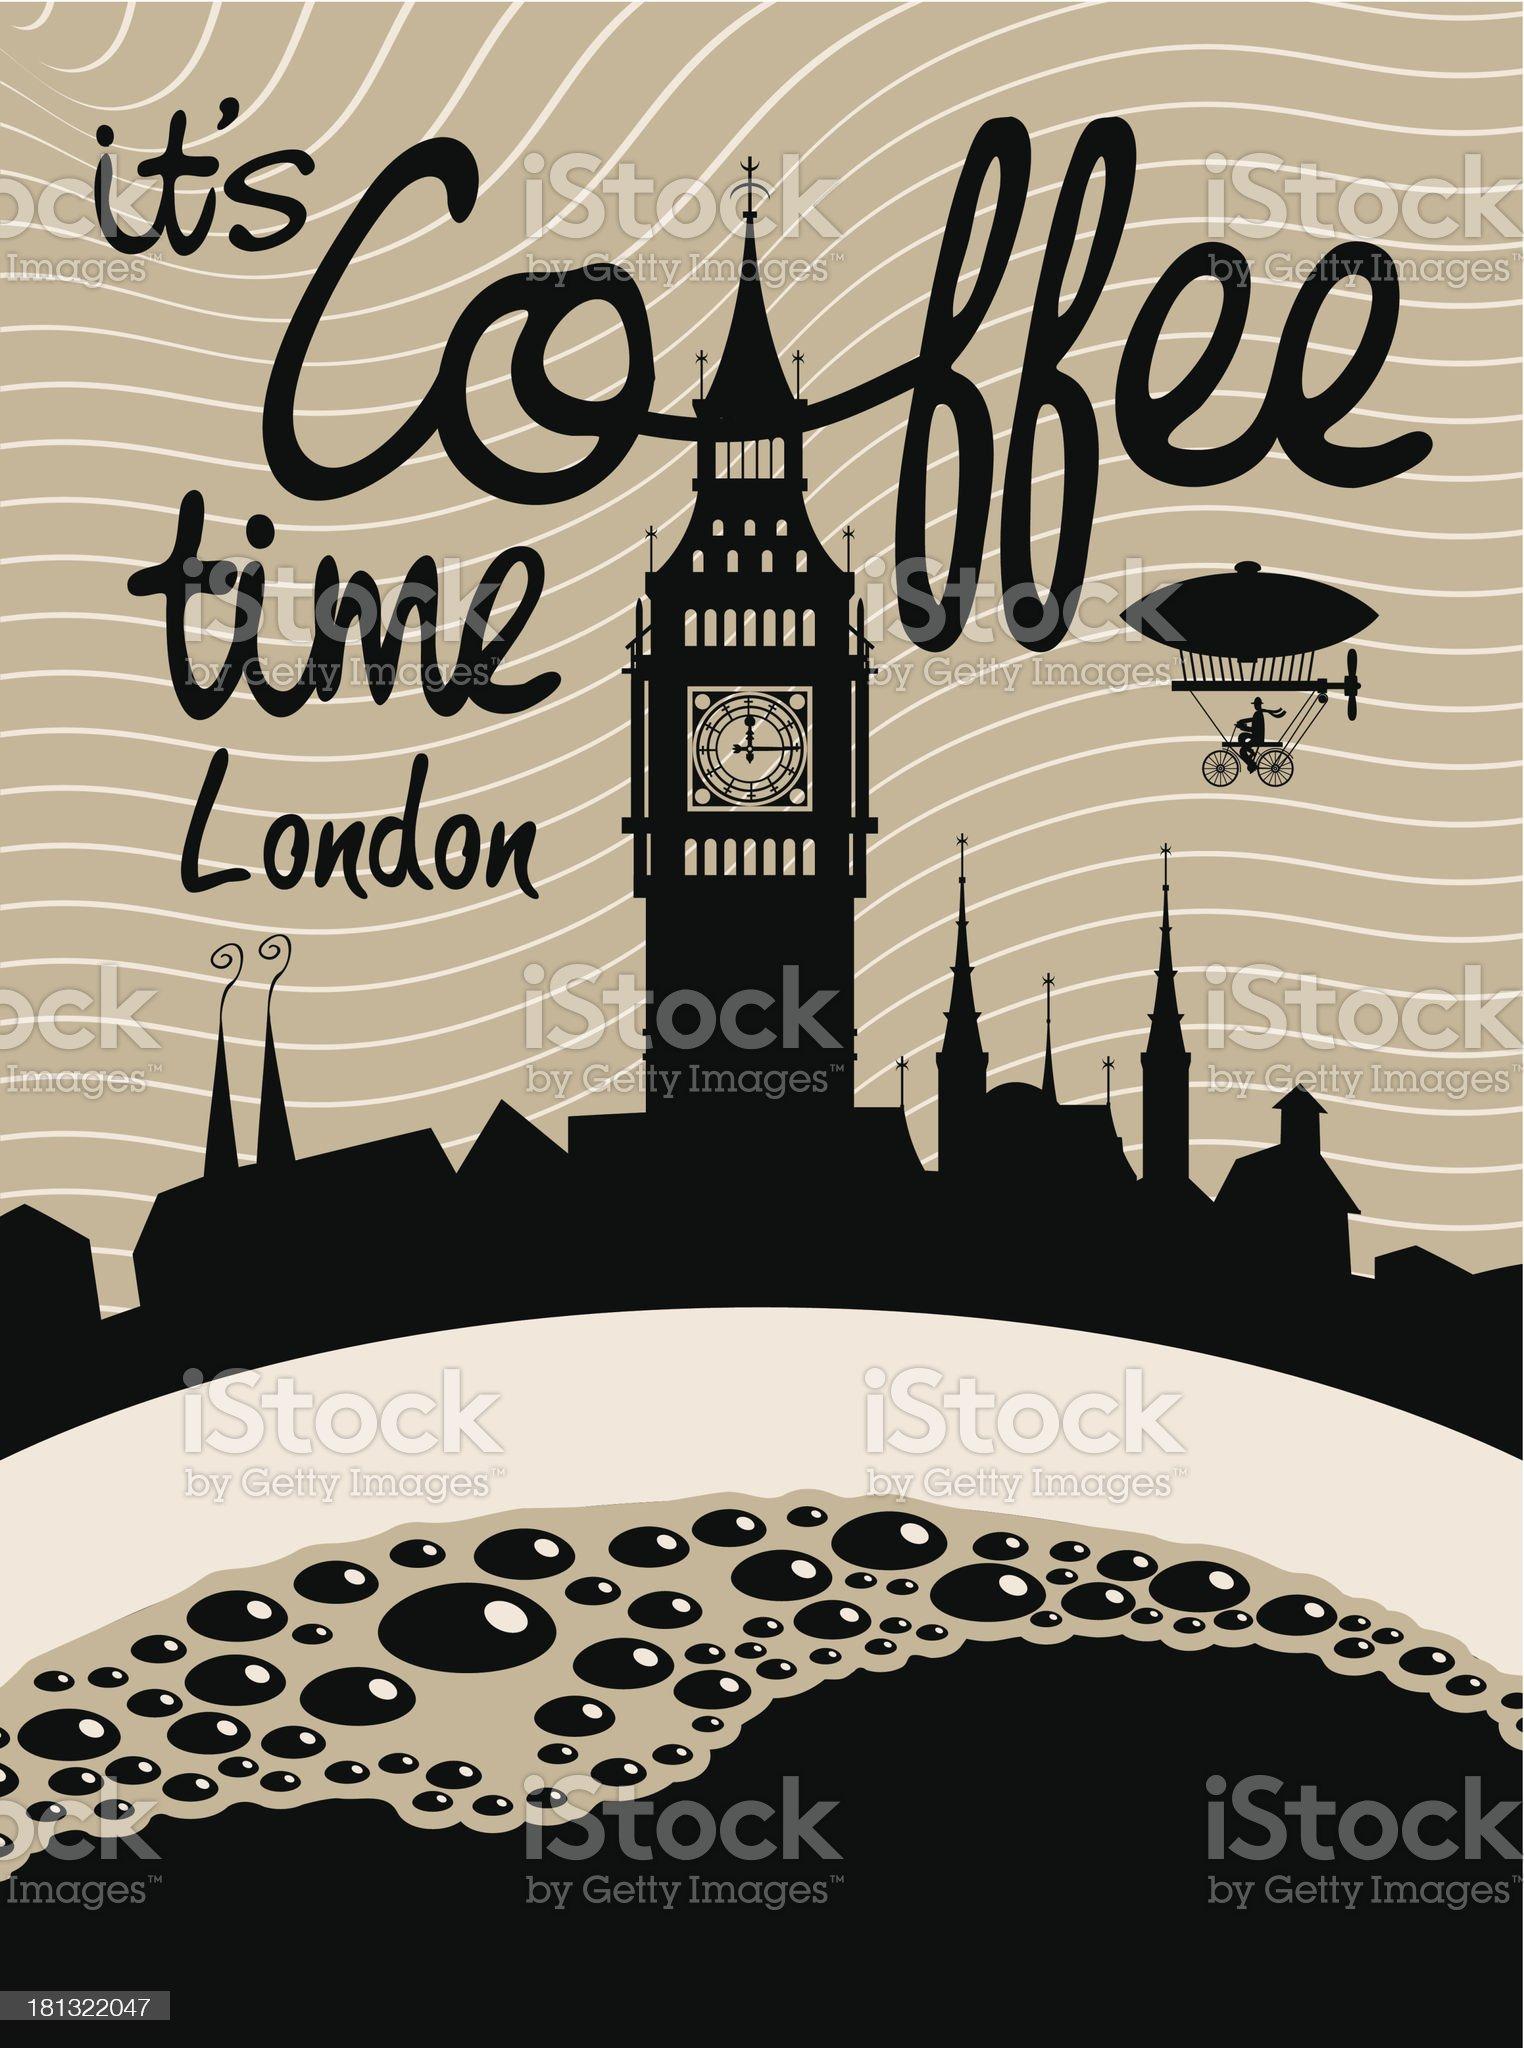 coffee london royalty-free stock vector art